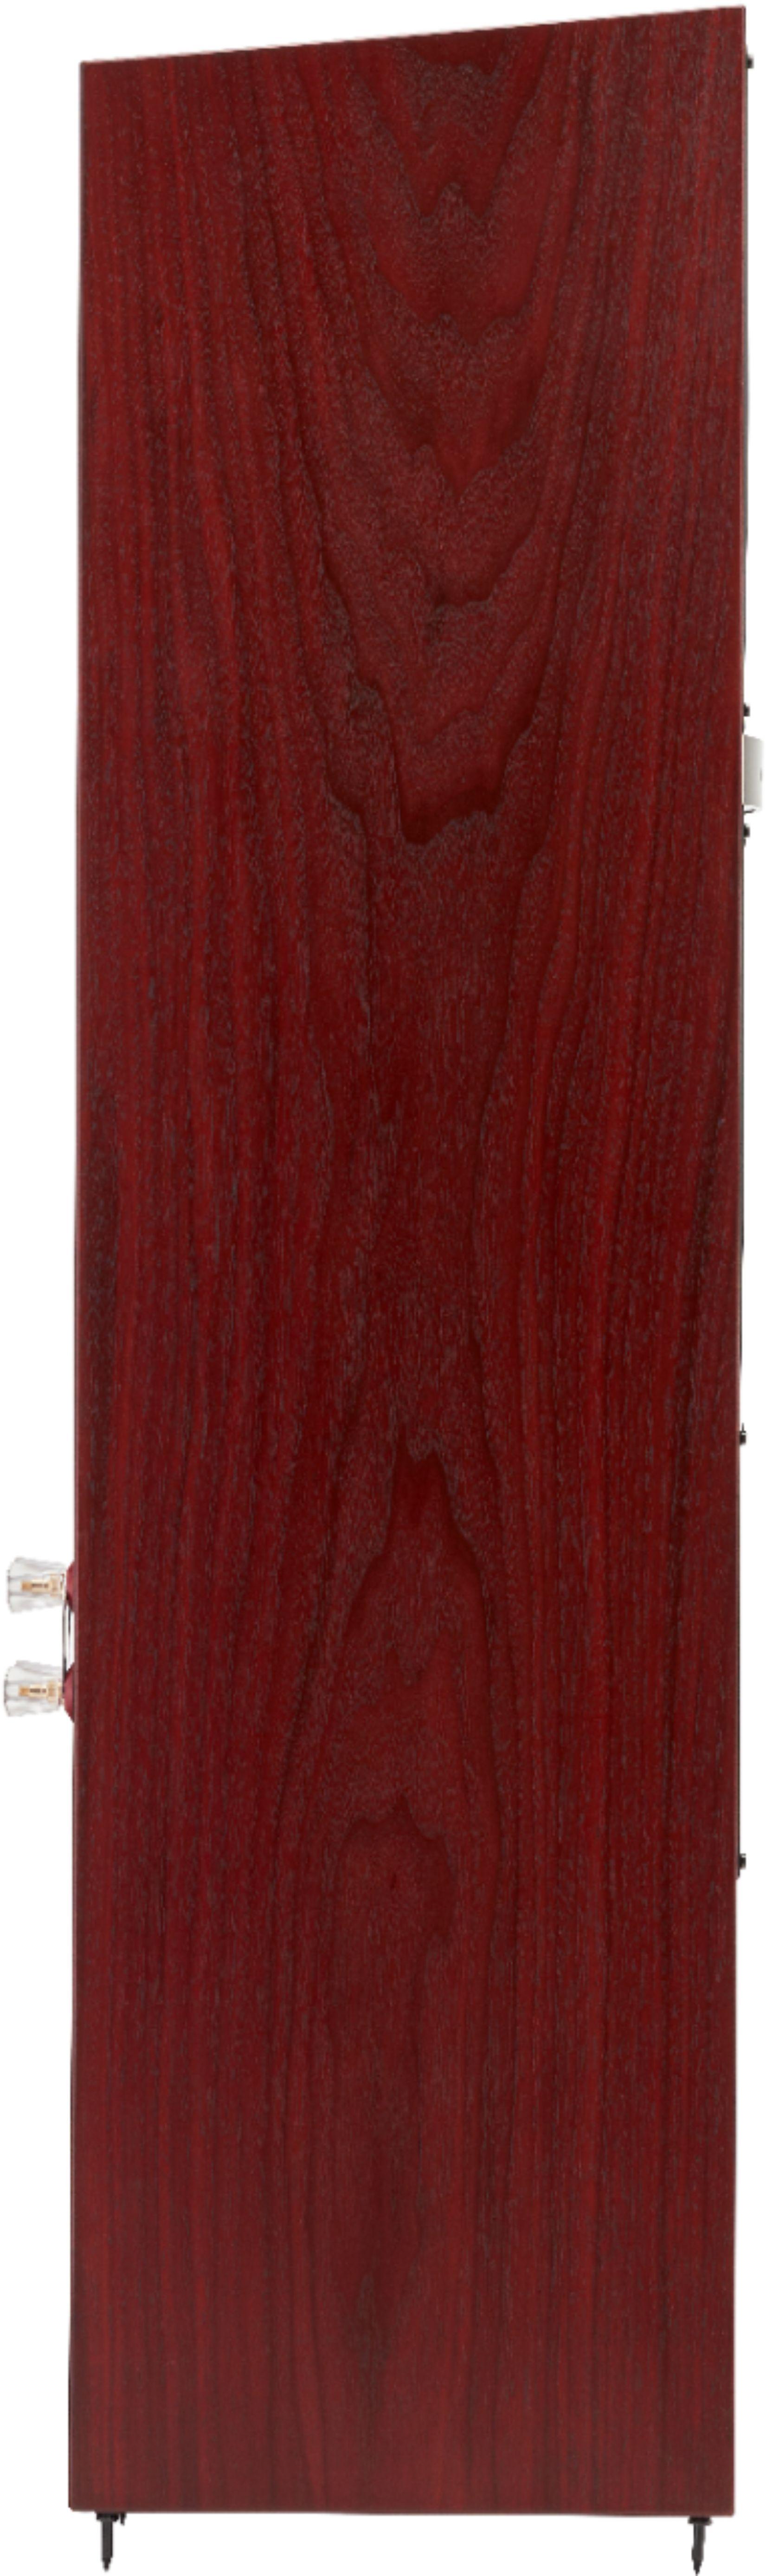 "Motion Dual 6-1/2"" Passive 2.5-Way Floor Speaker (Each) Red Walnut"